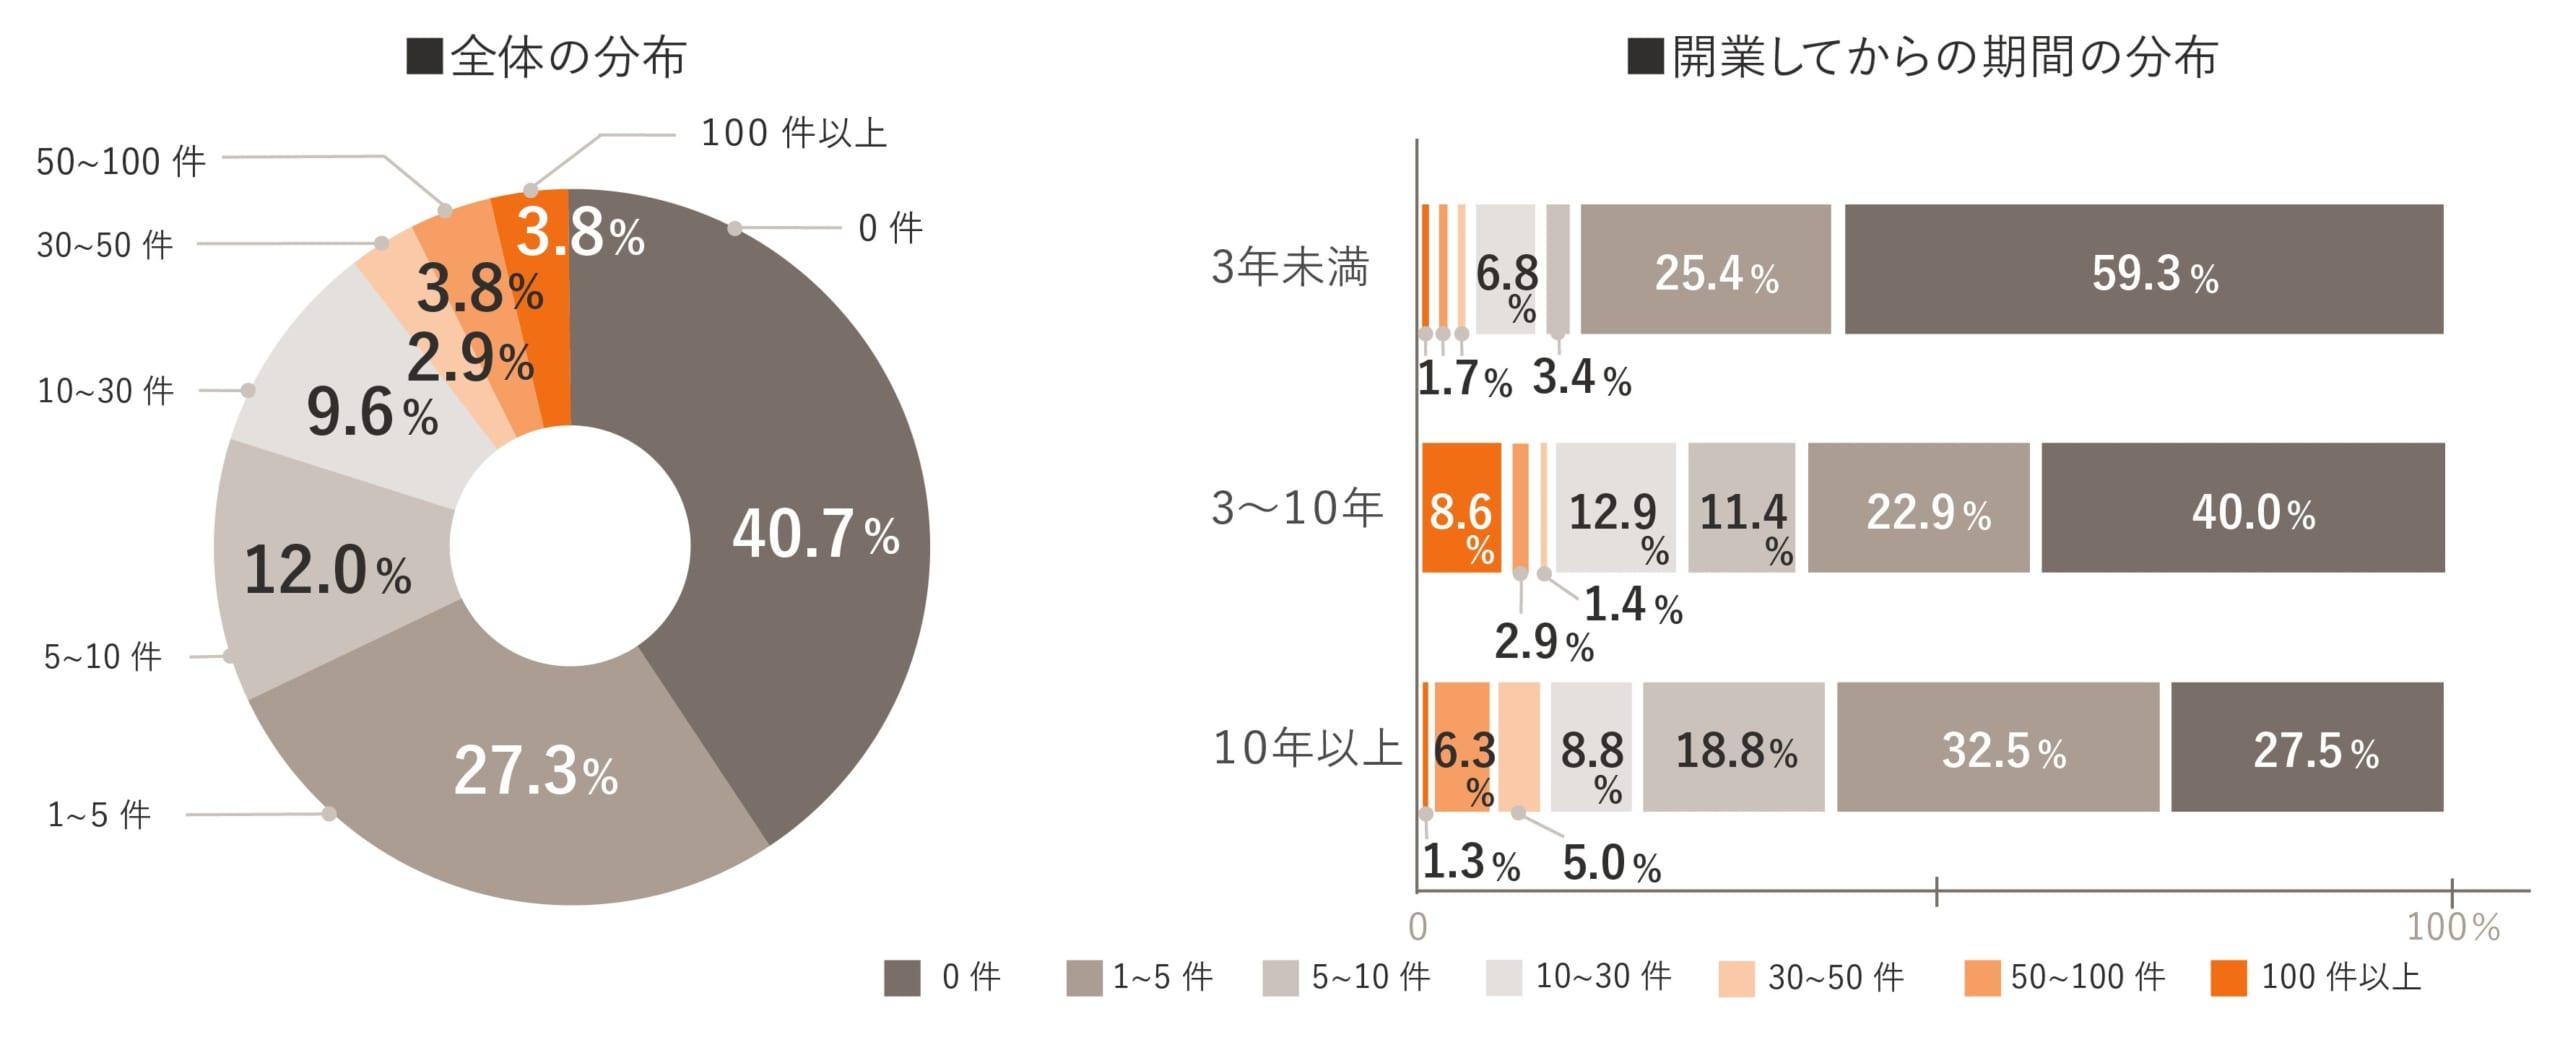 独立開業実態調査グラフ11